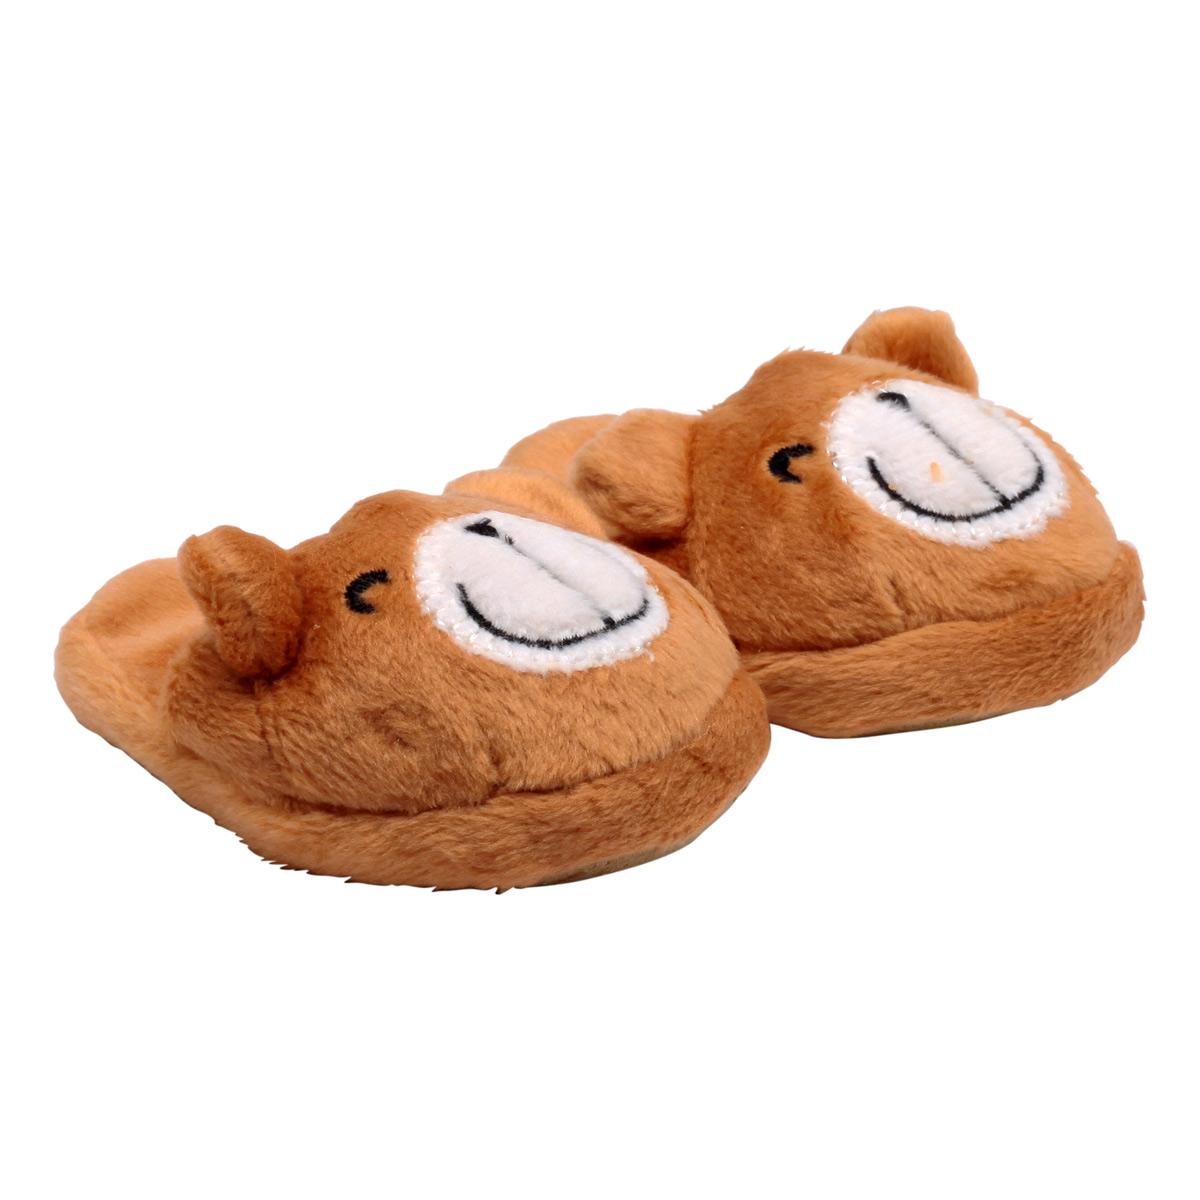 MISU-7298 Тапочки для кукол 'Мишки', 7см